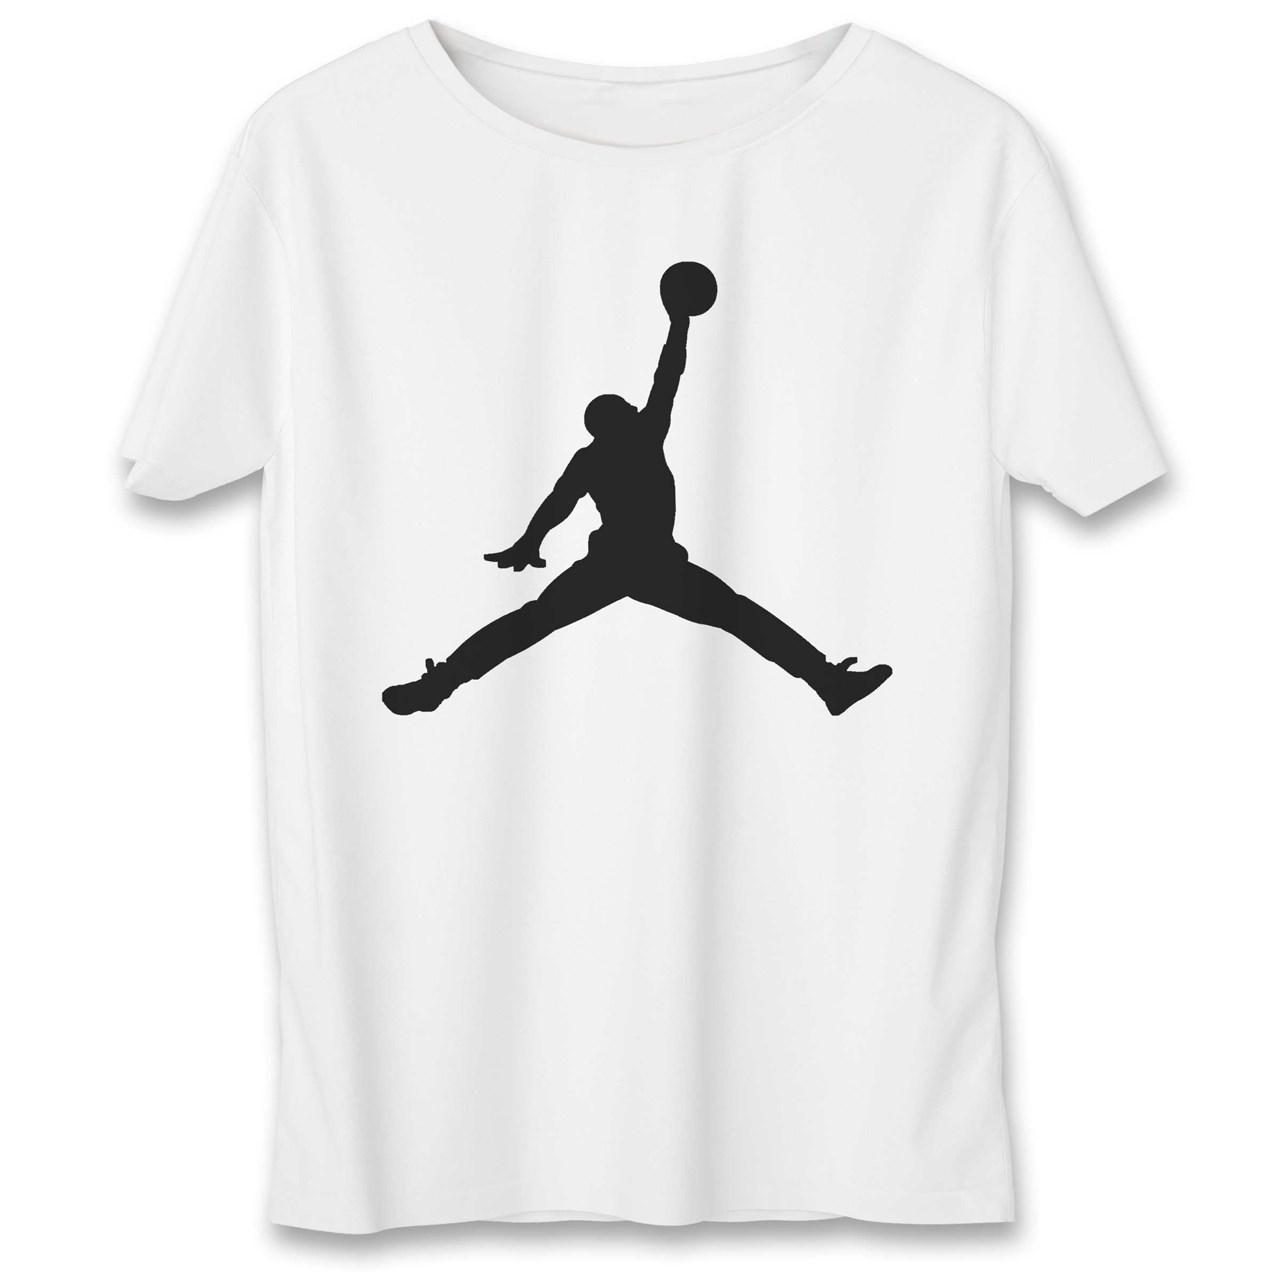 قیمت تی شرت یورپرینت به رسم طرح مایکل جردن کد 329